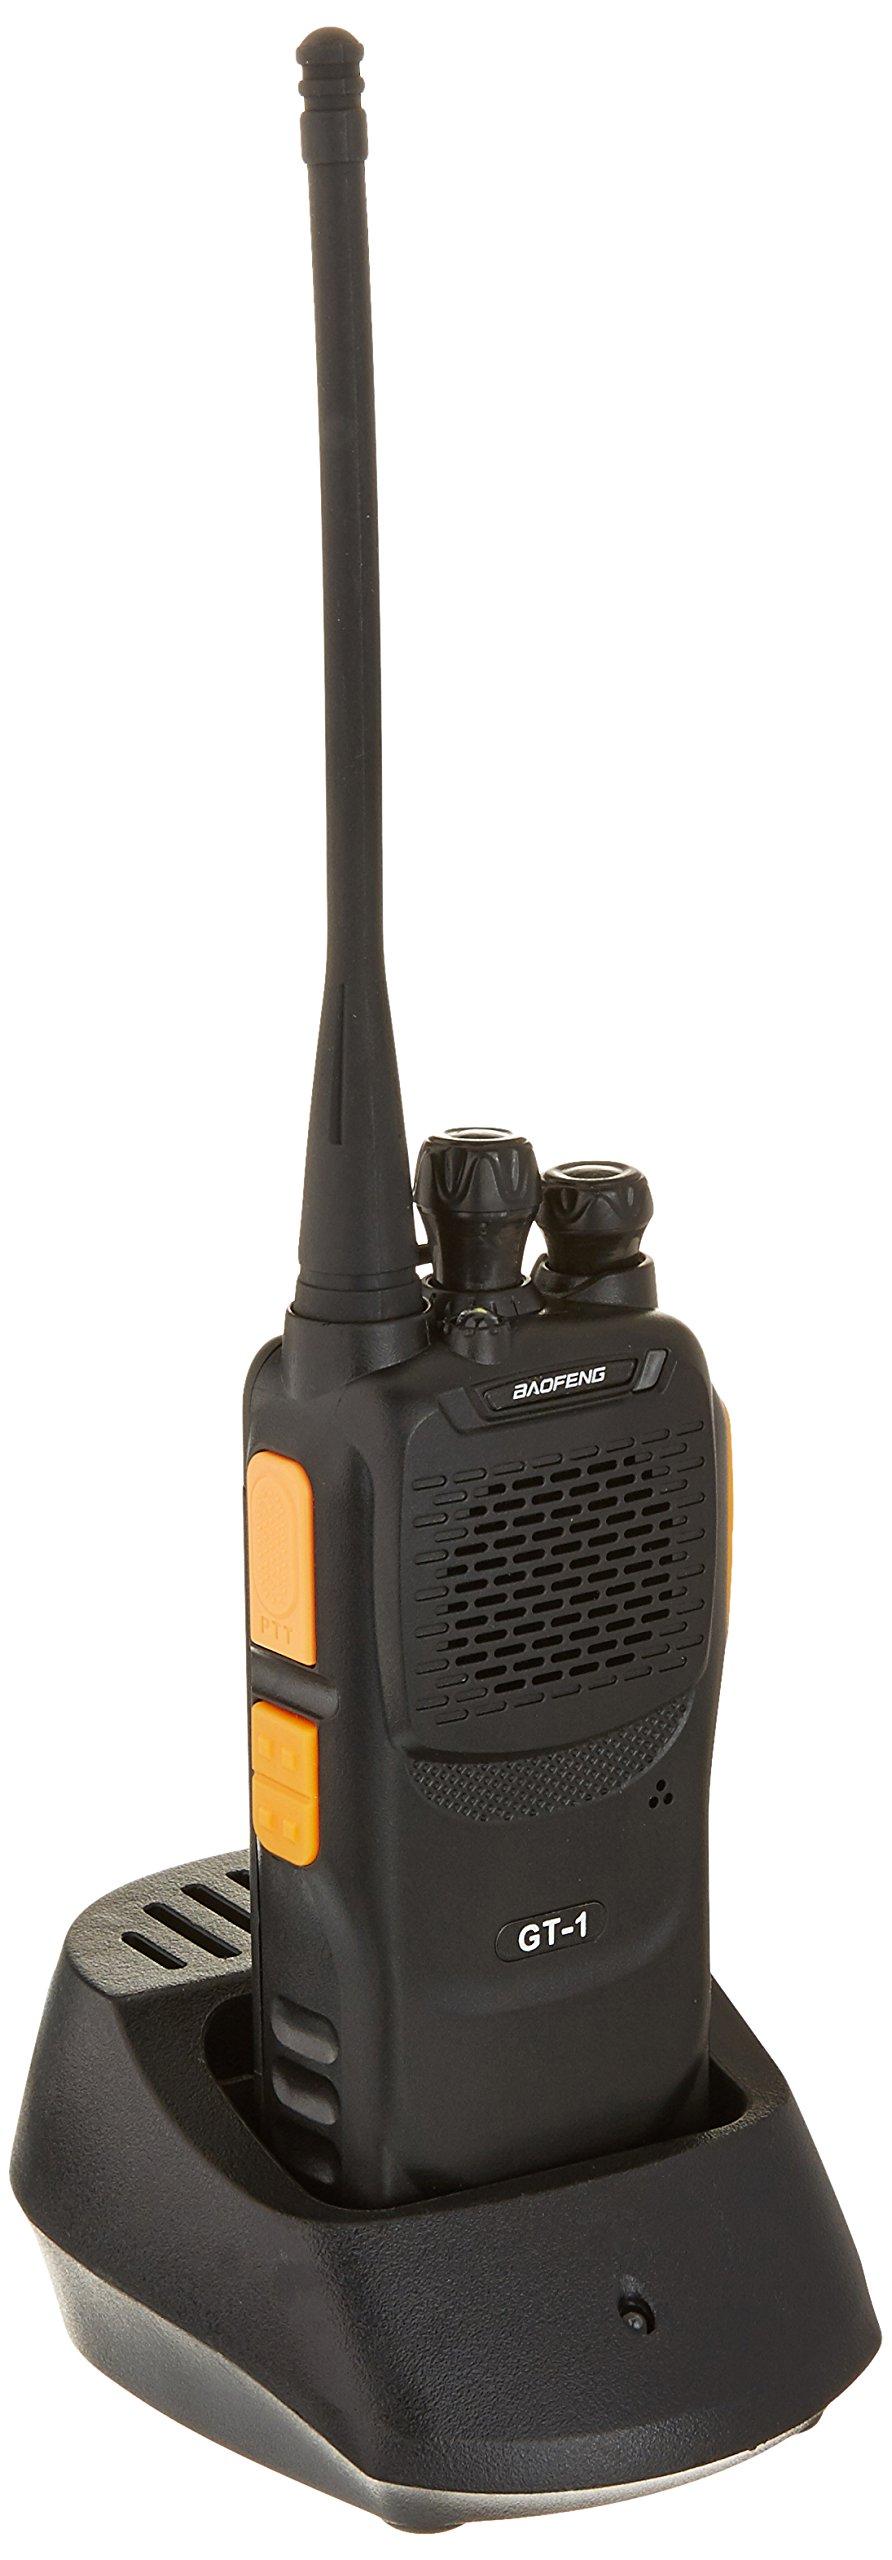 Baofeng Pofung GT-1 UHF 400-470MHz FM Two-Way Ham Radio, 16 Channels, 1500mAh Battery (Yellow)